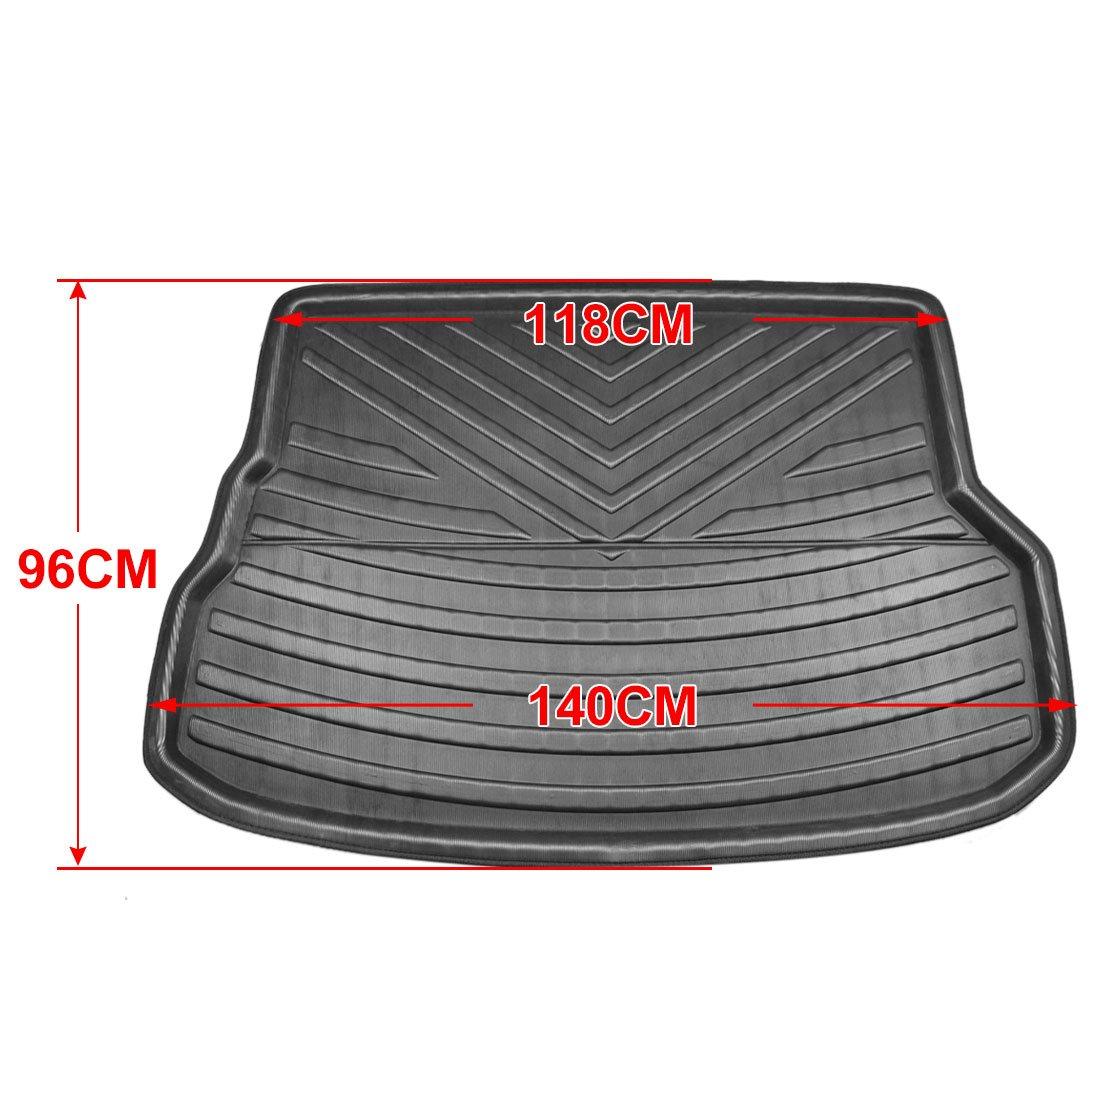 X AUTOHAUX Black Rear Trunk Boot Liner Cargo Mat Floor Tray for Lexus RX270 RX350 10-15